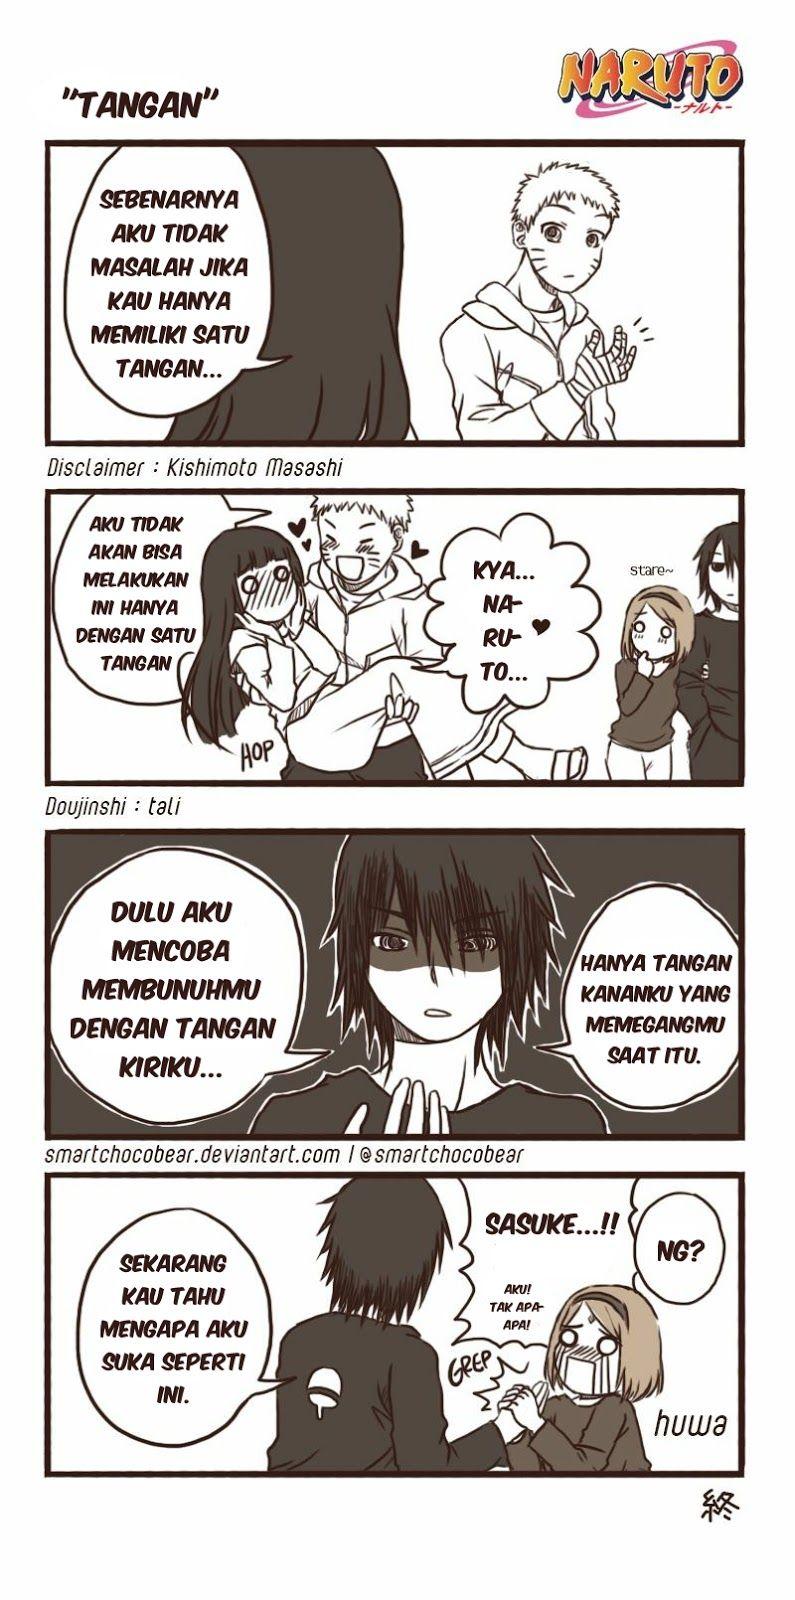 Kumpulan Komik Lucu & Kocak Naruto